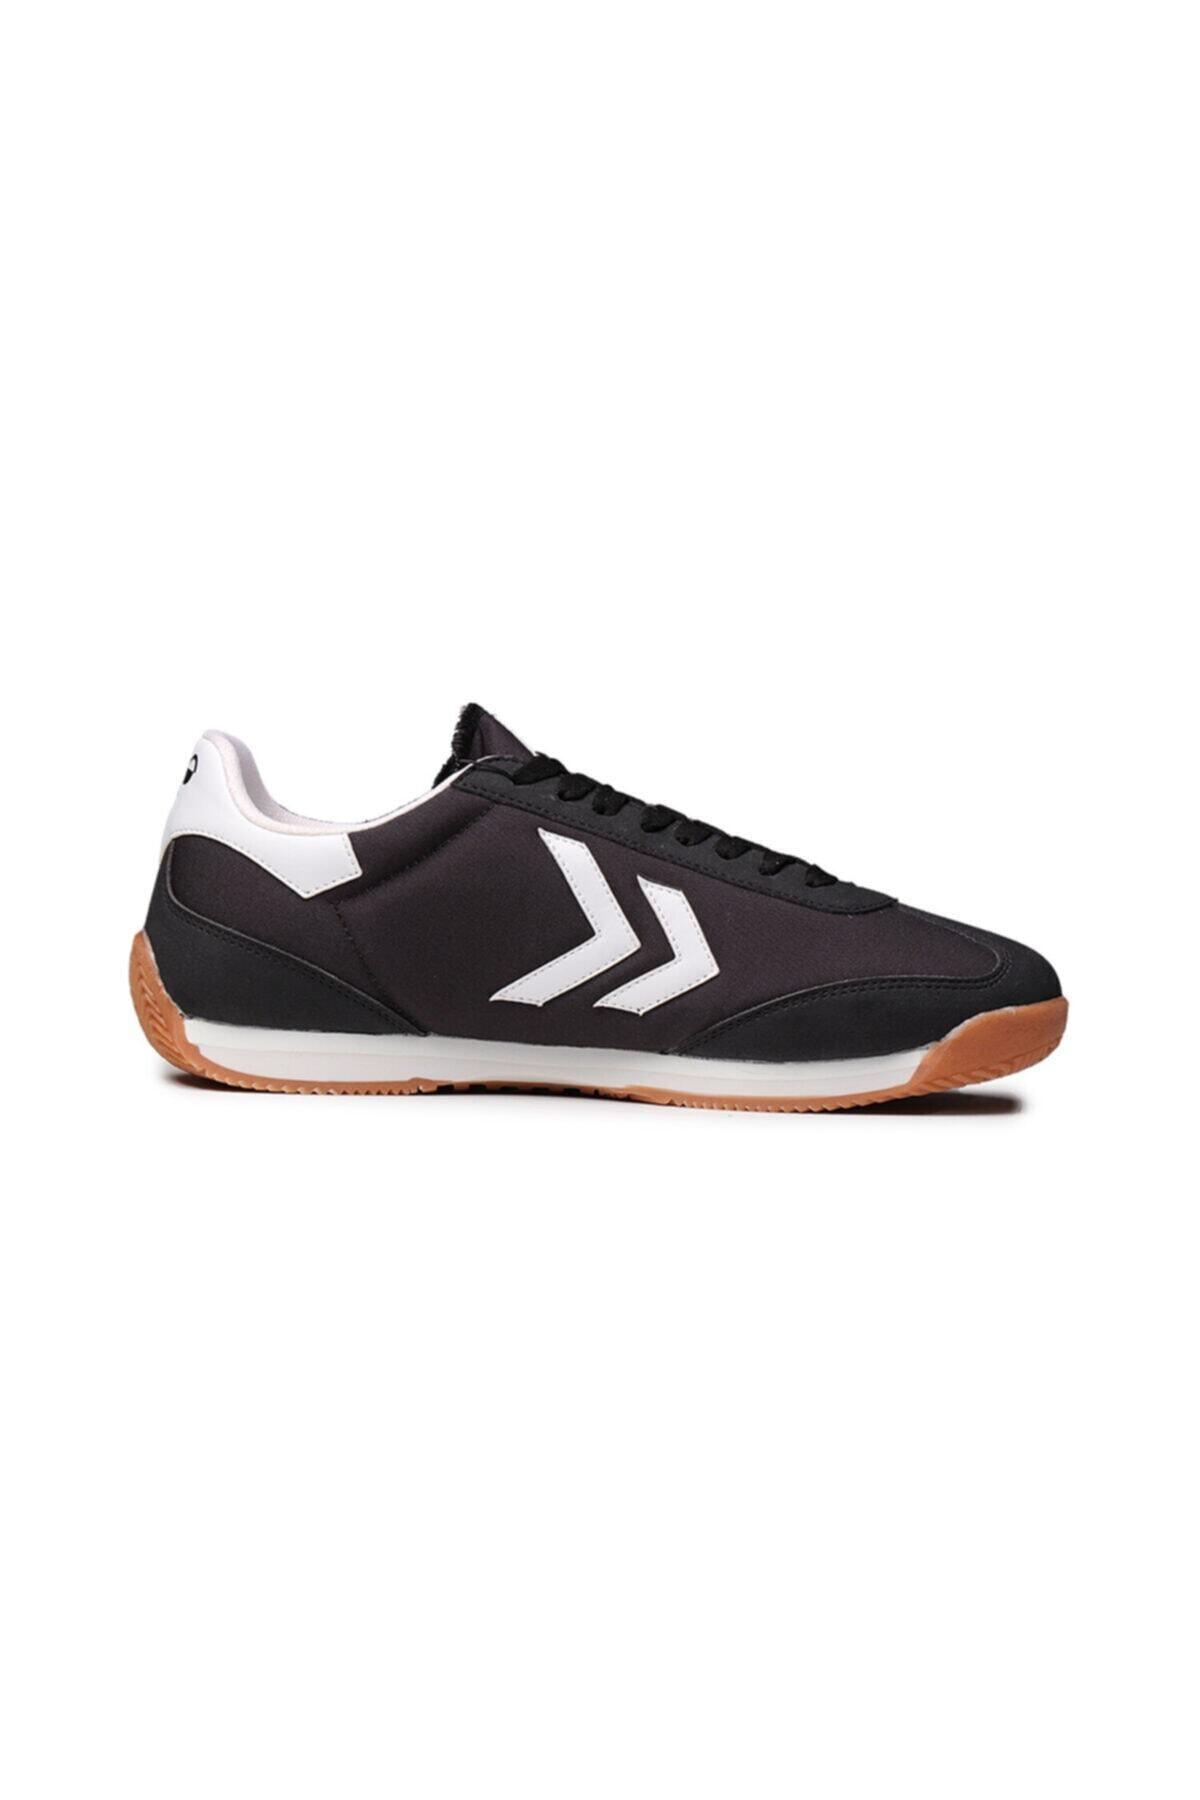 HUMMEL Stadion III Lifestyle Siyah Unisex Spor Ayakkabı 2